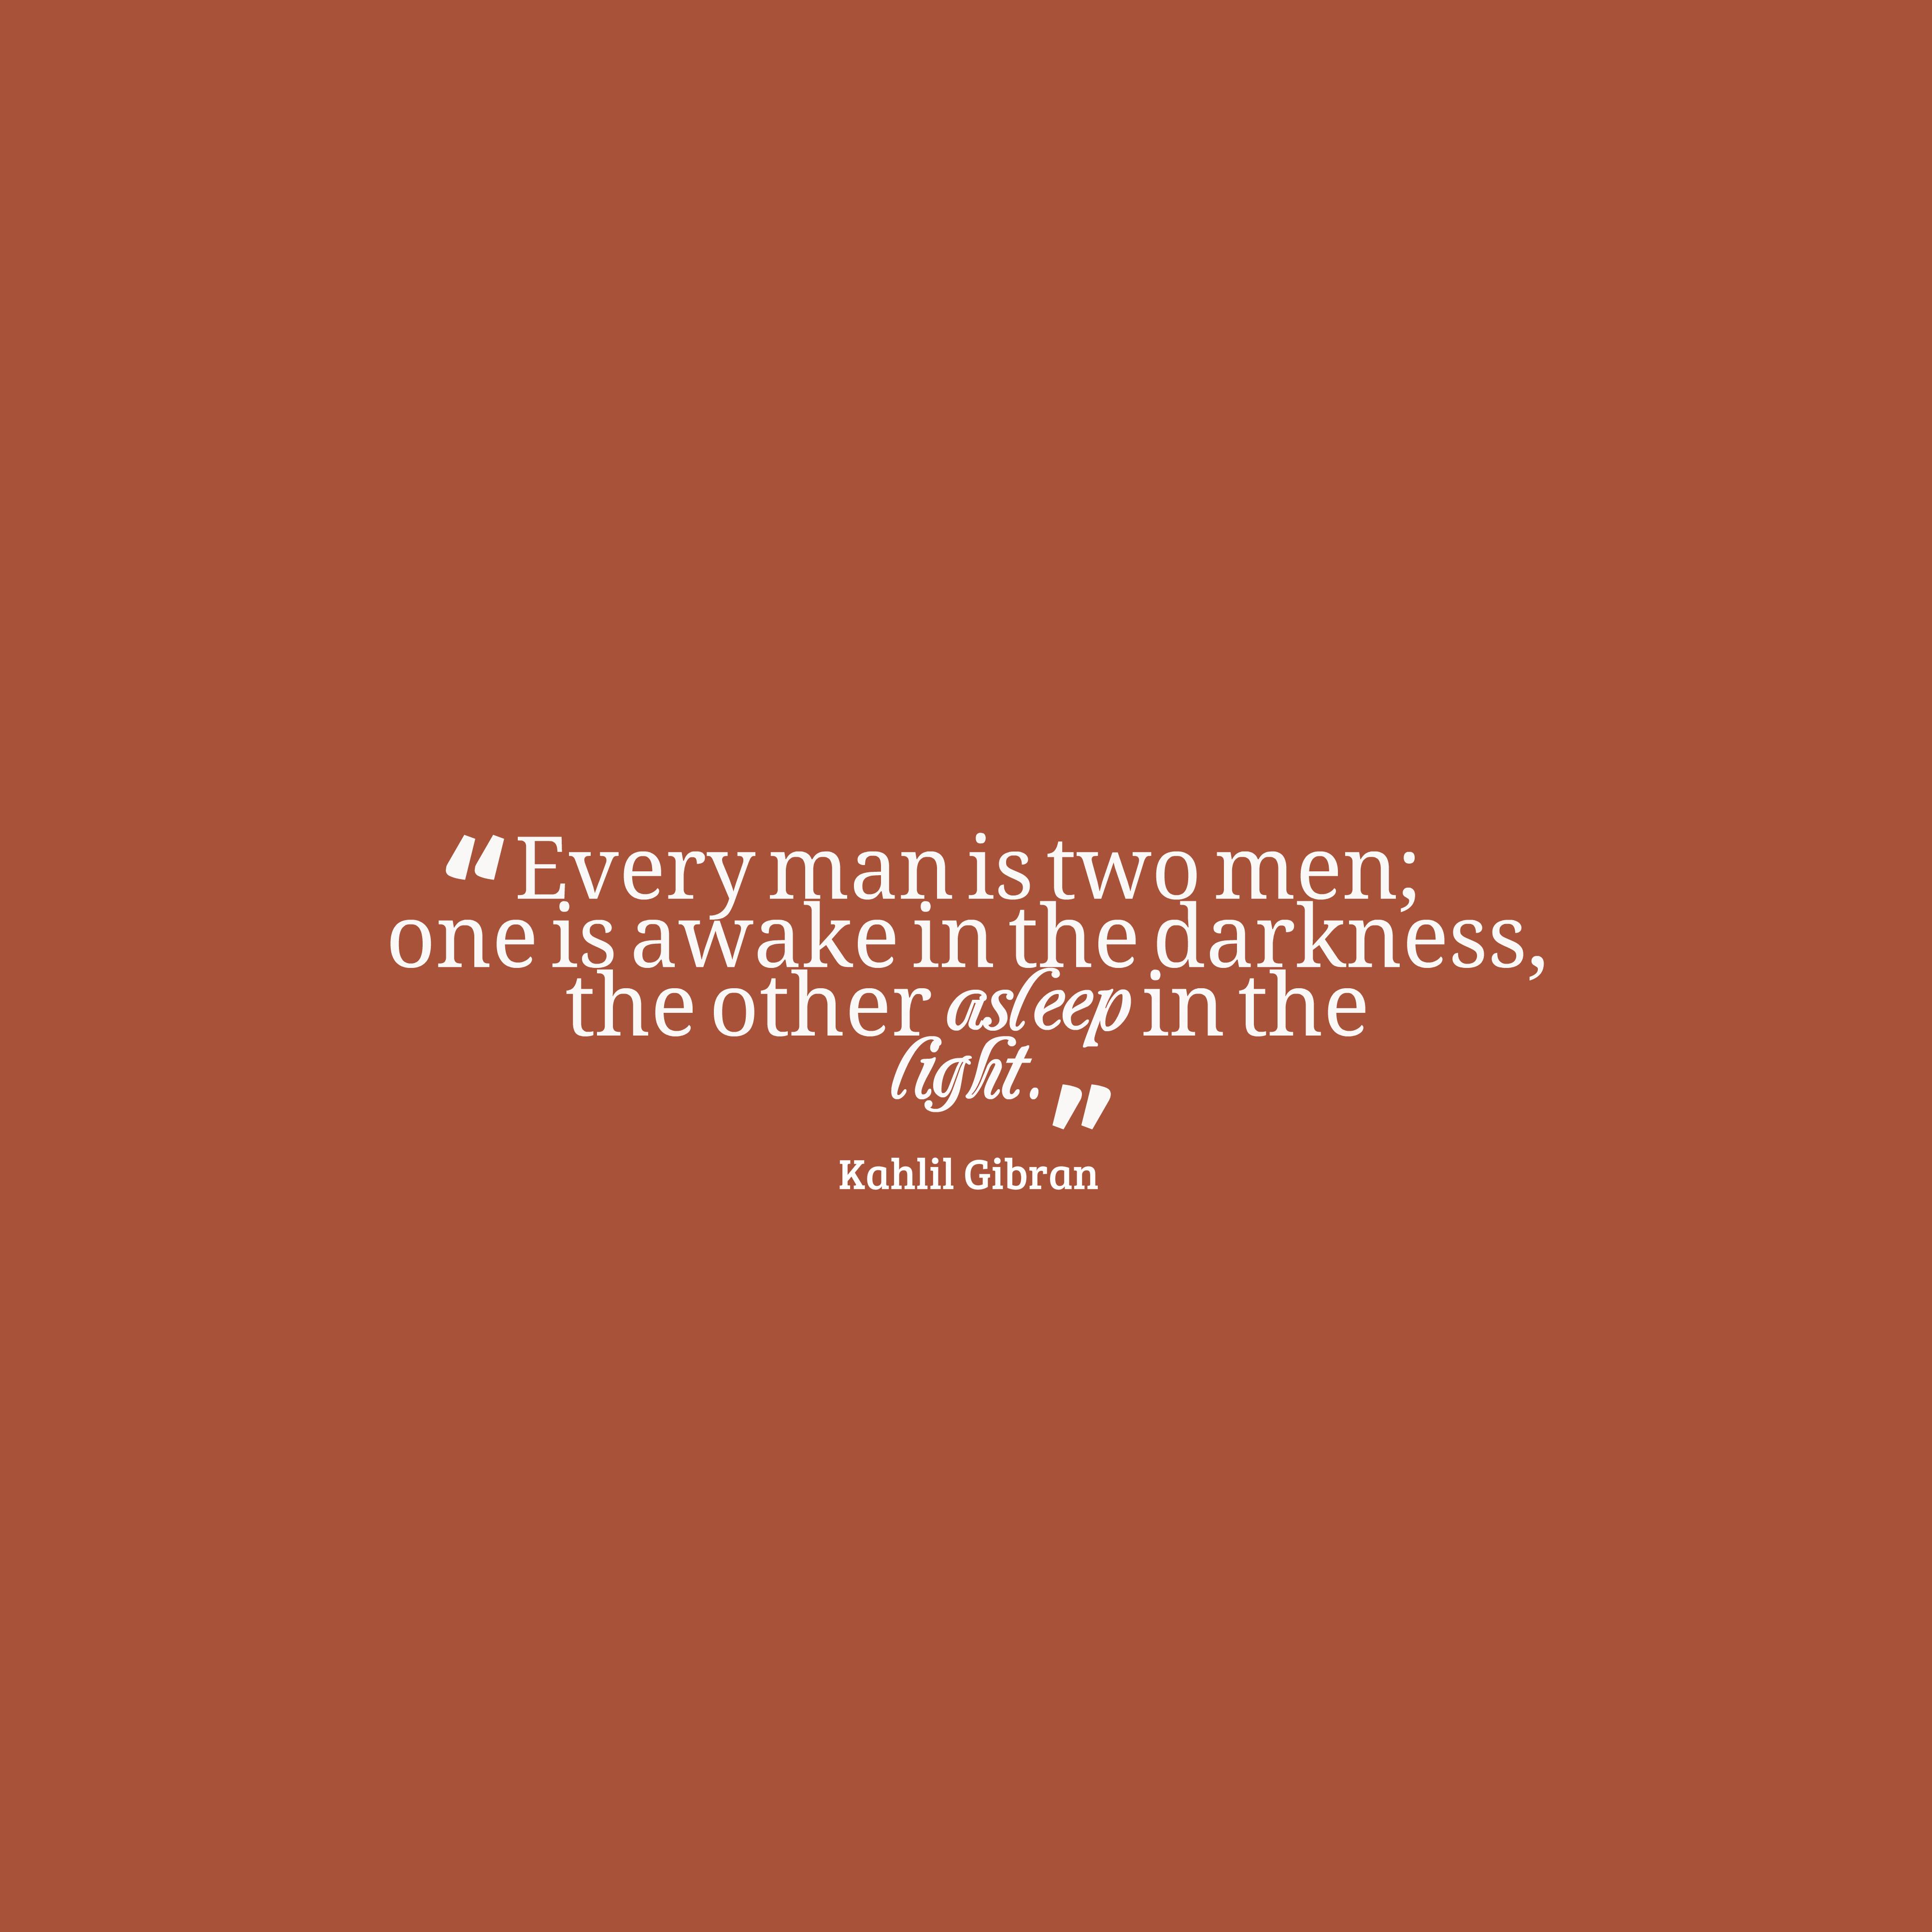 Kahlil Gibran Quotes 51 Best Kahlil Gibran Quotes Images